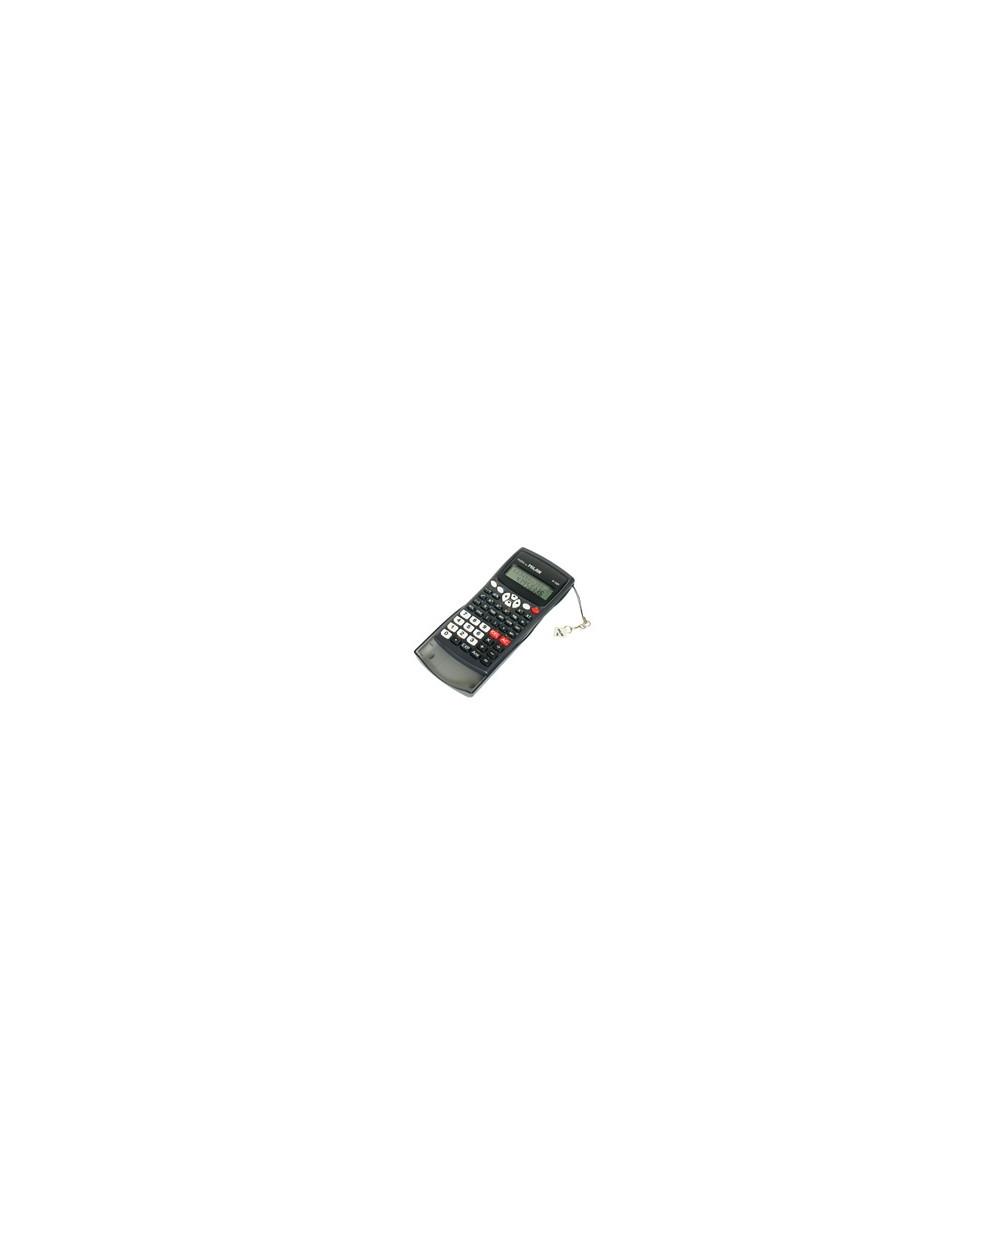 Калкулатор MILAN, научен, 12 разр., 240 функции, черен